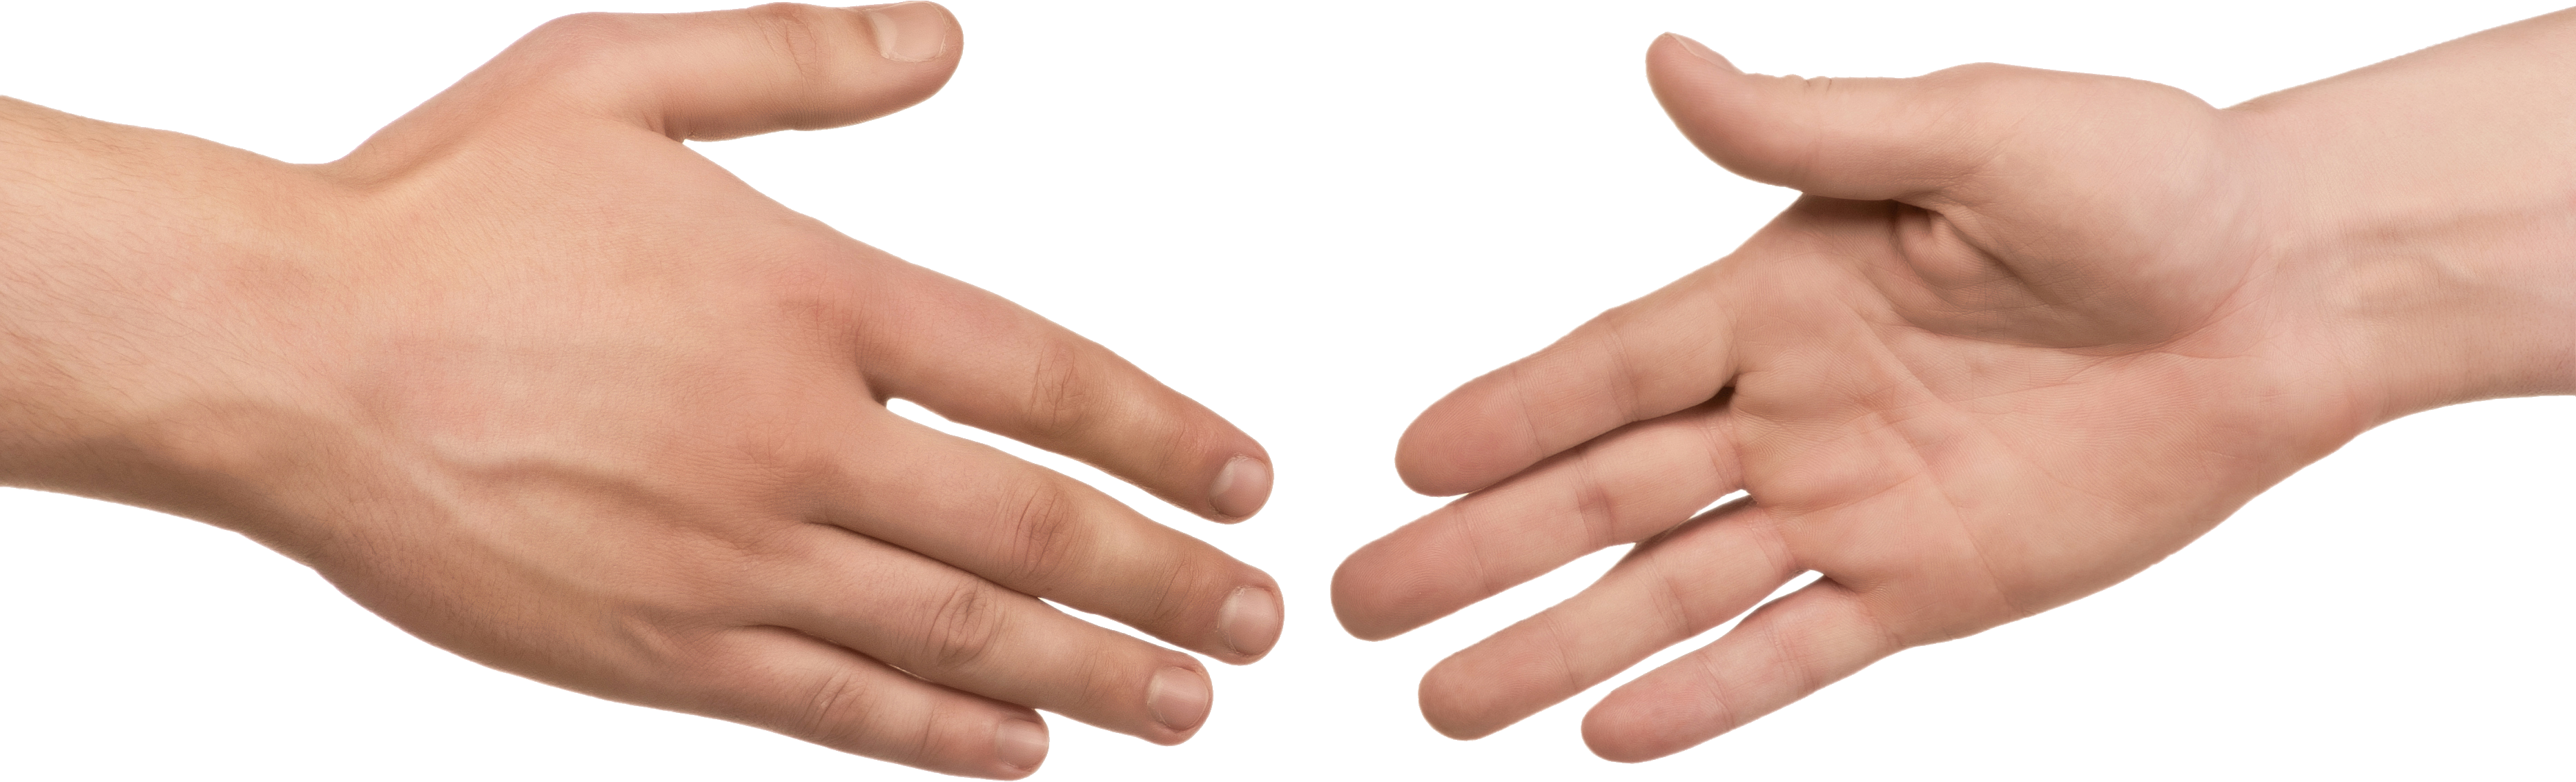 handshake PNG, hands image, free download - Hands PNG